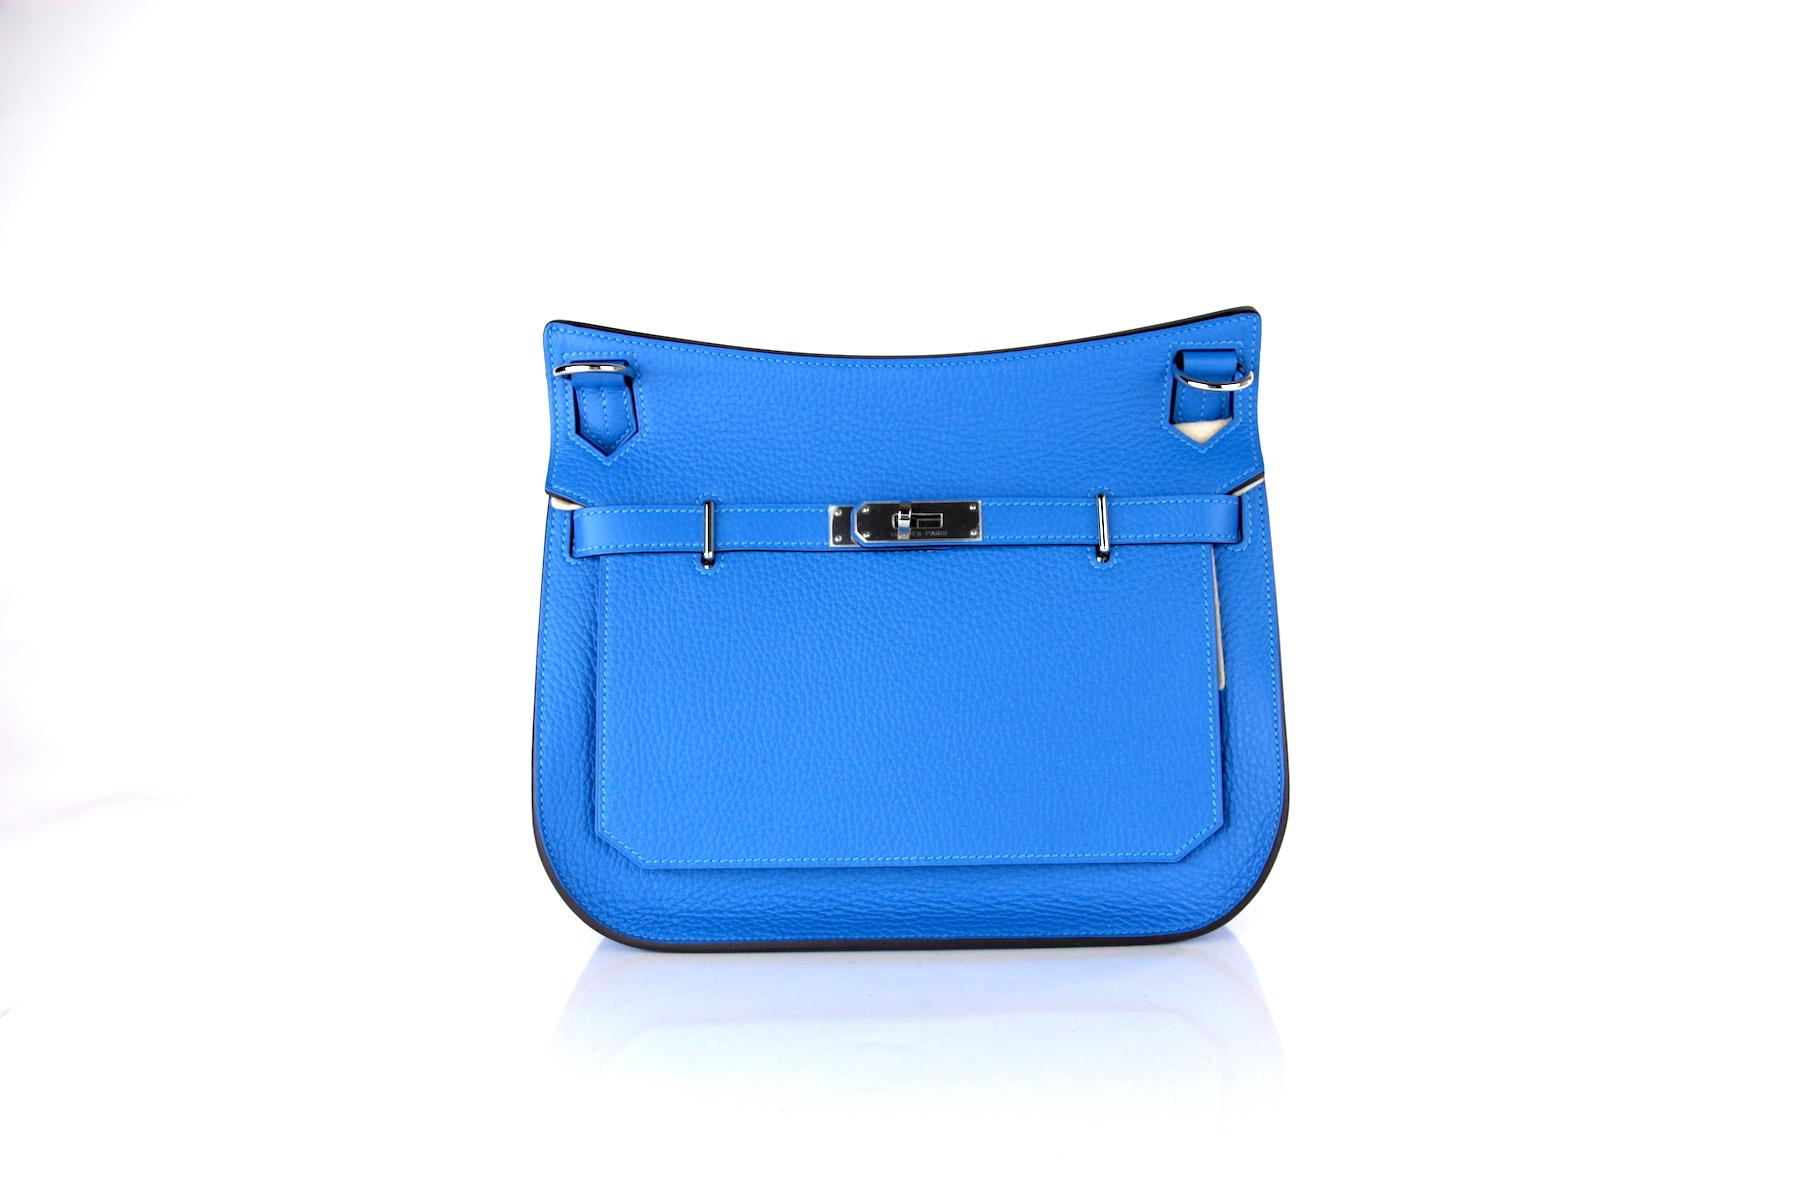 Hermes Bleu Hydra Jypsiere 28cm Clemence Bag